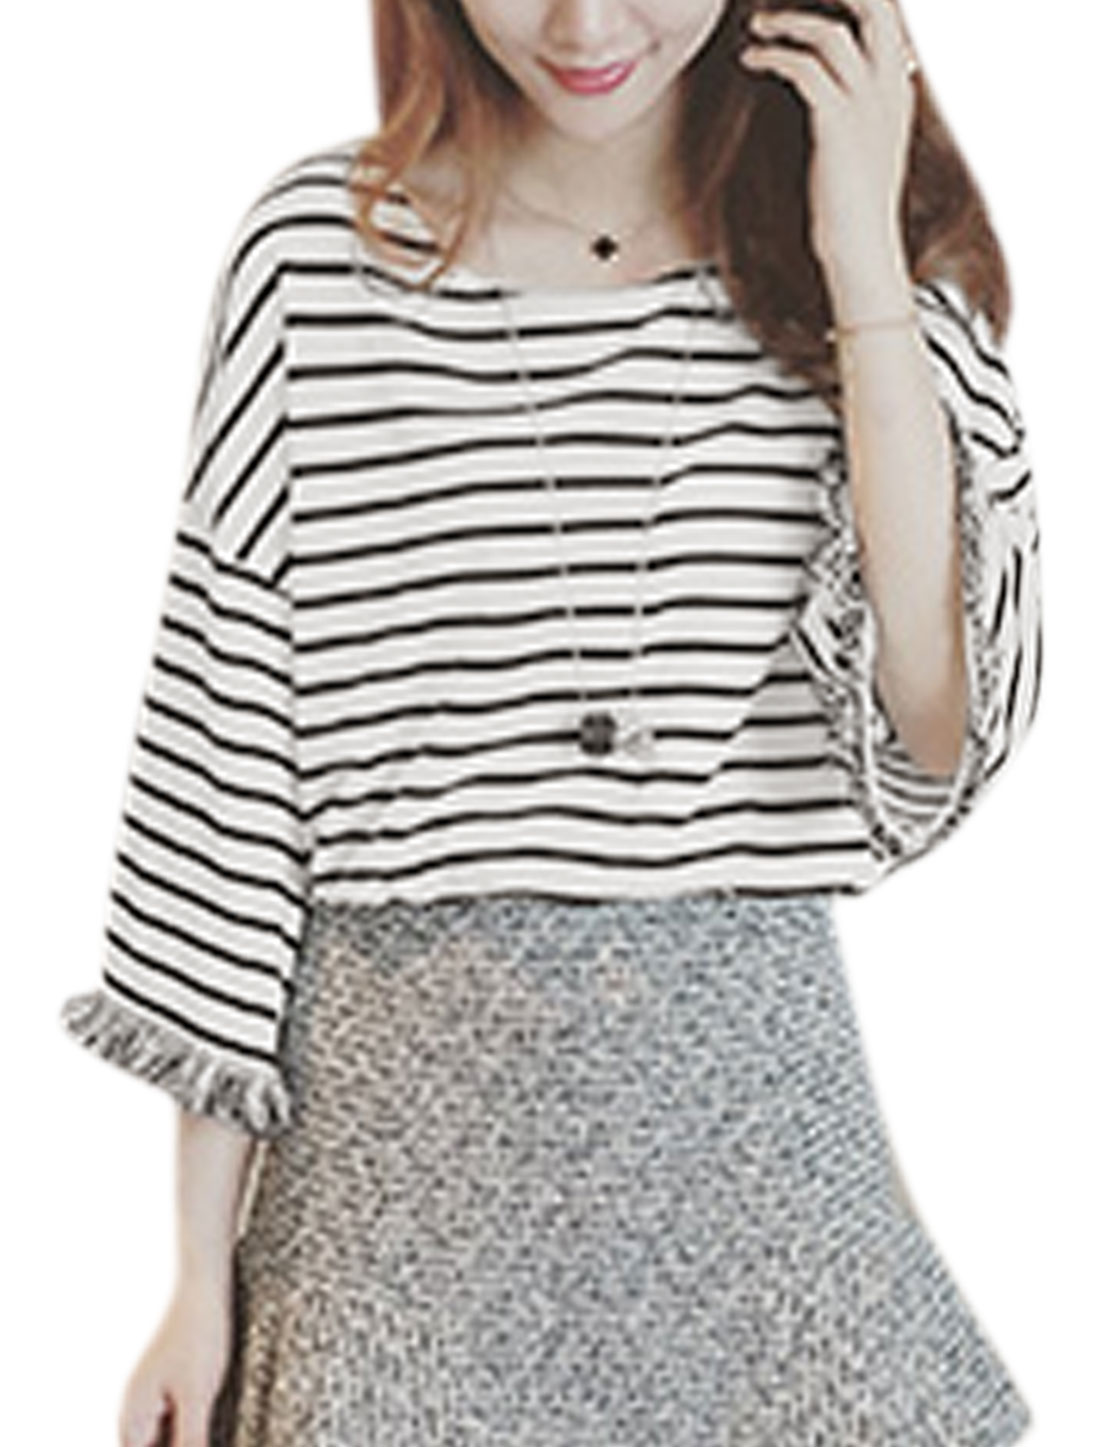 Women 3/4 Sleeve Drop Shoulder Stripes Loose Fit Tassels Top White M